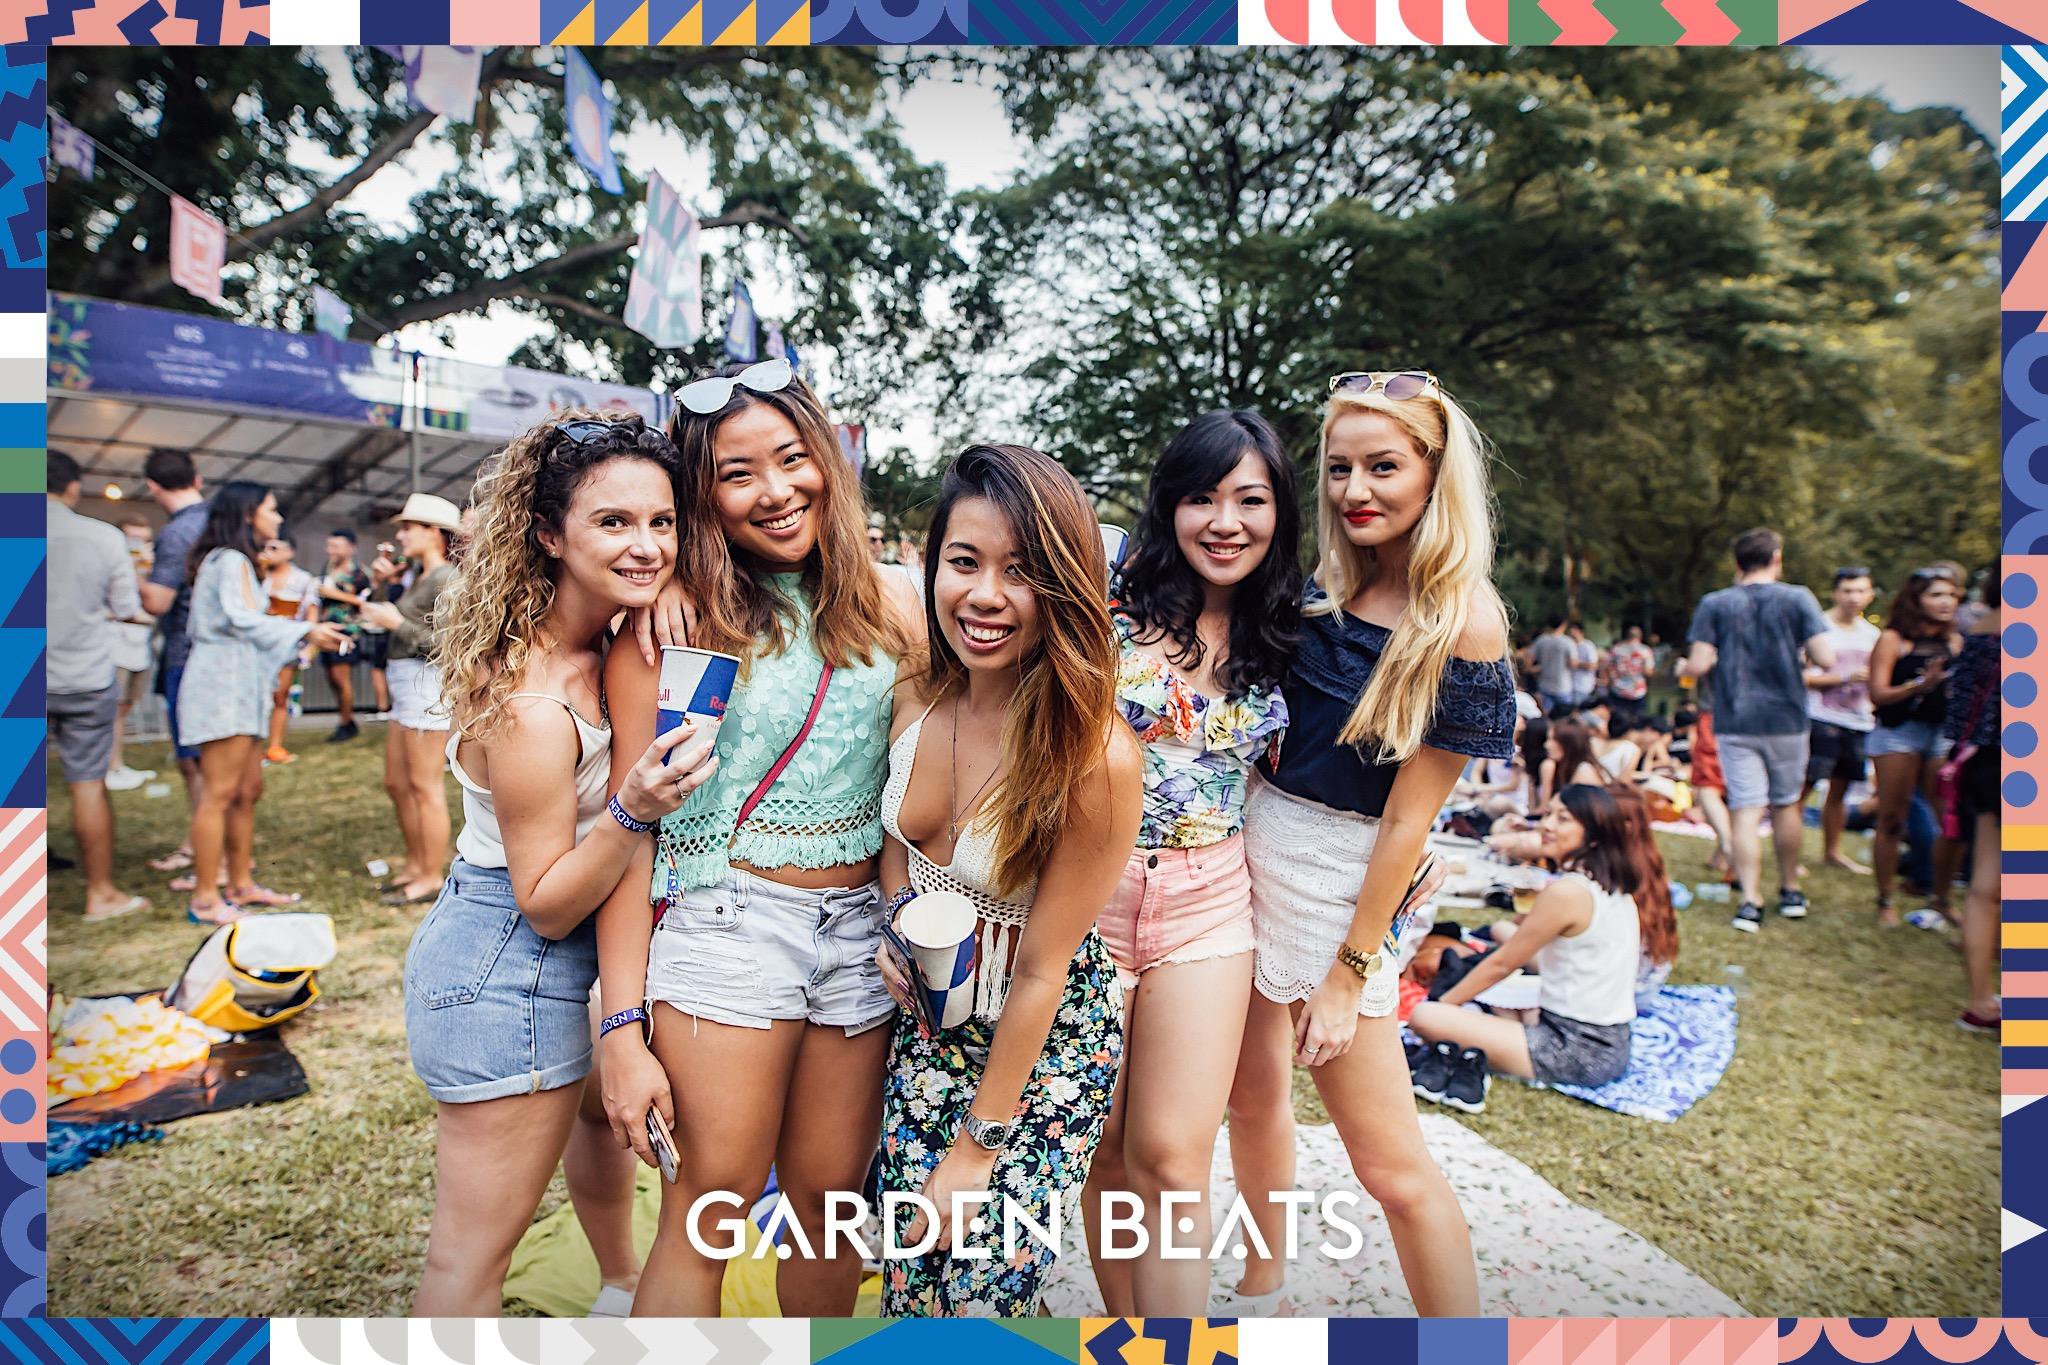 18032017_GardenBeats_Colossal625_WatermarkedGB.jpg